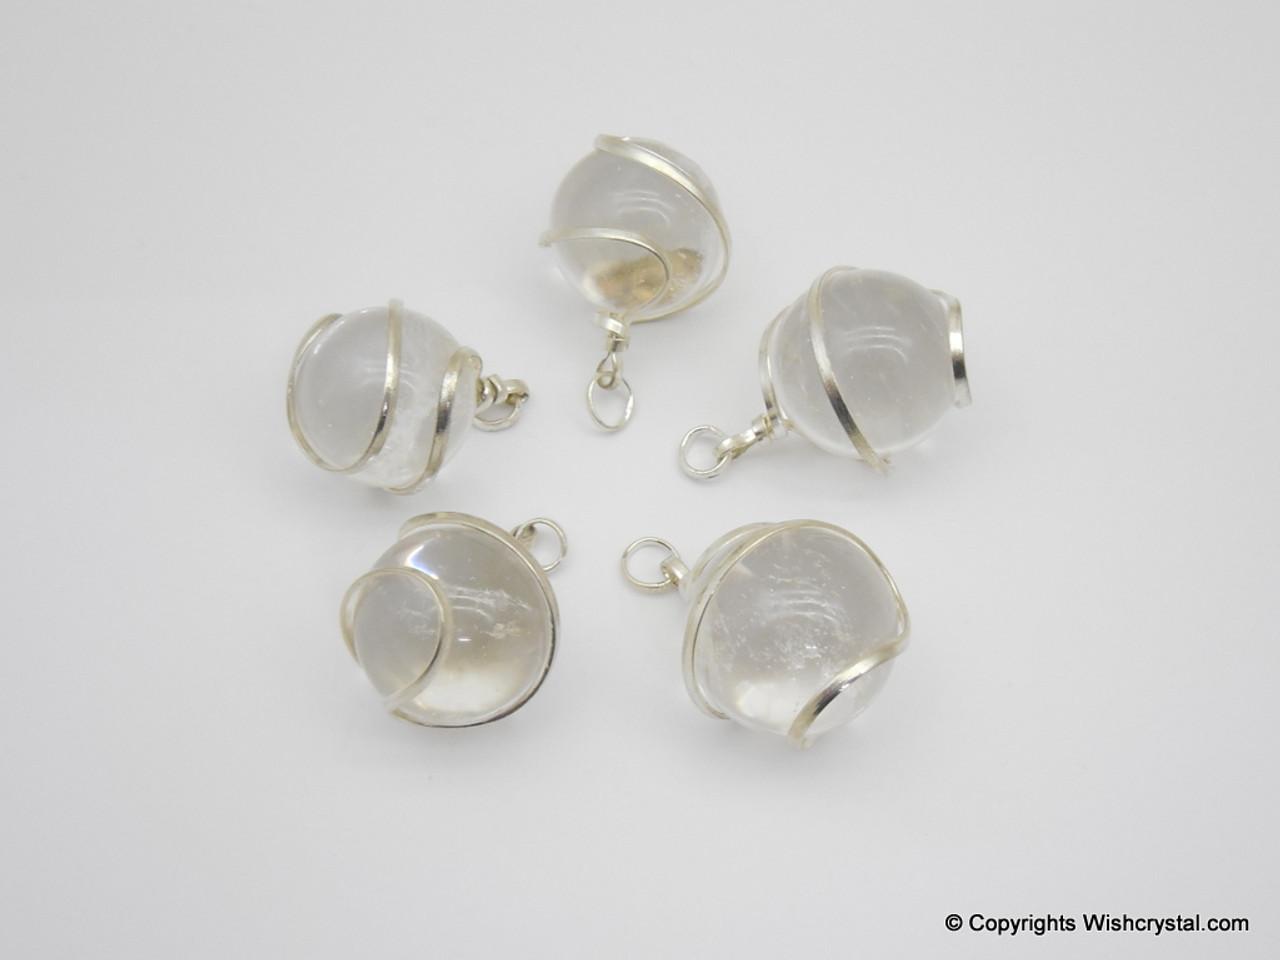 Crystal Quartz sphere / ball wire wrap pendant - Wishcrystal.com